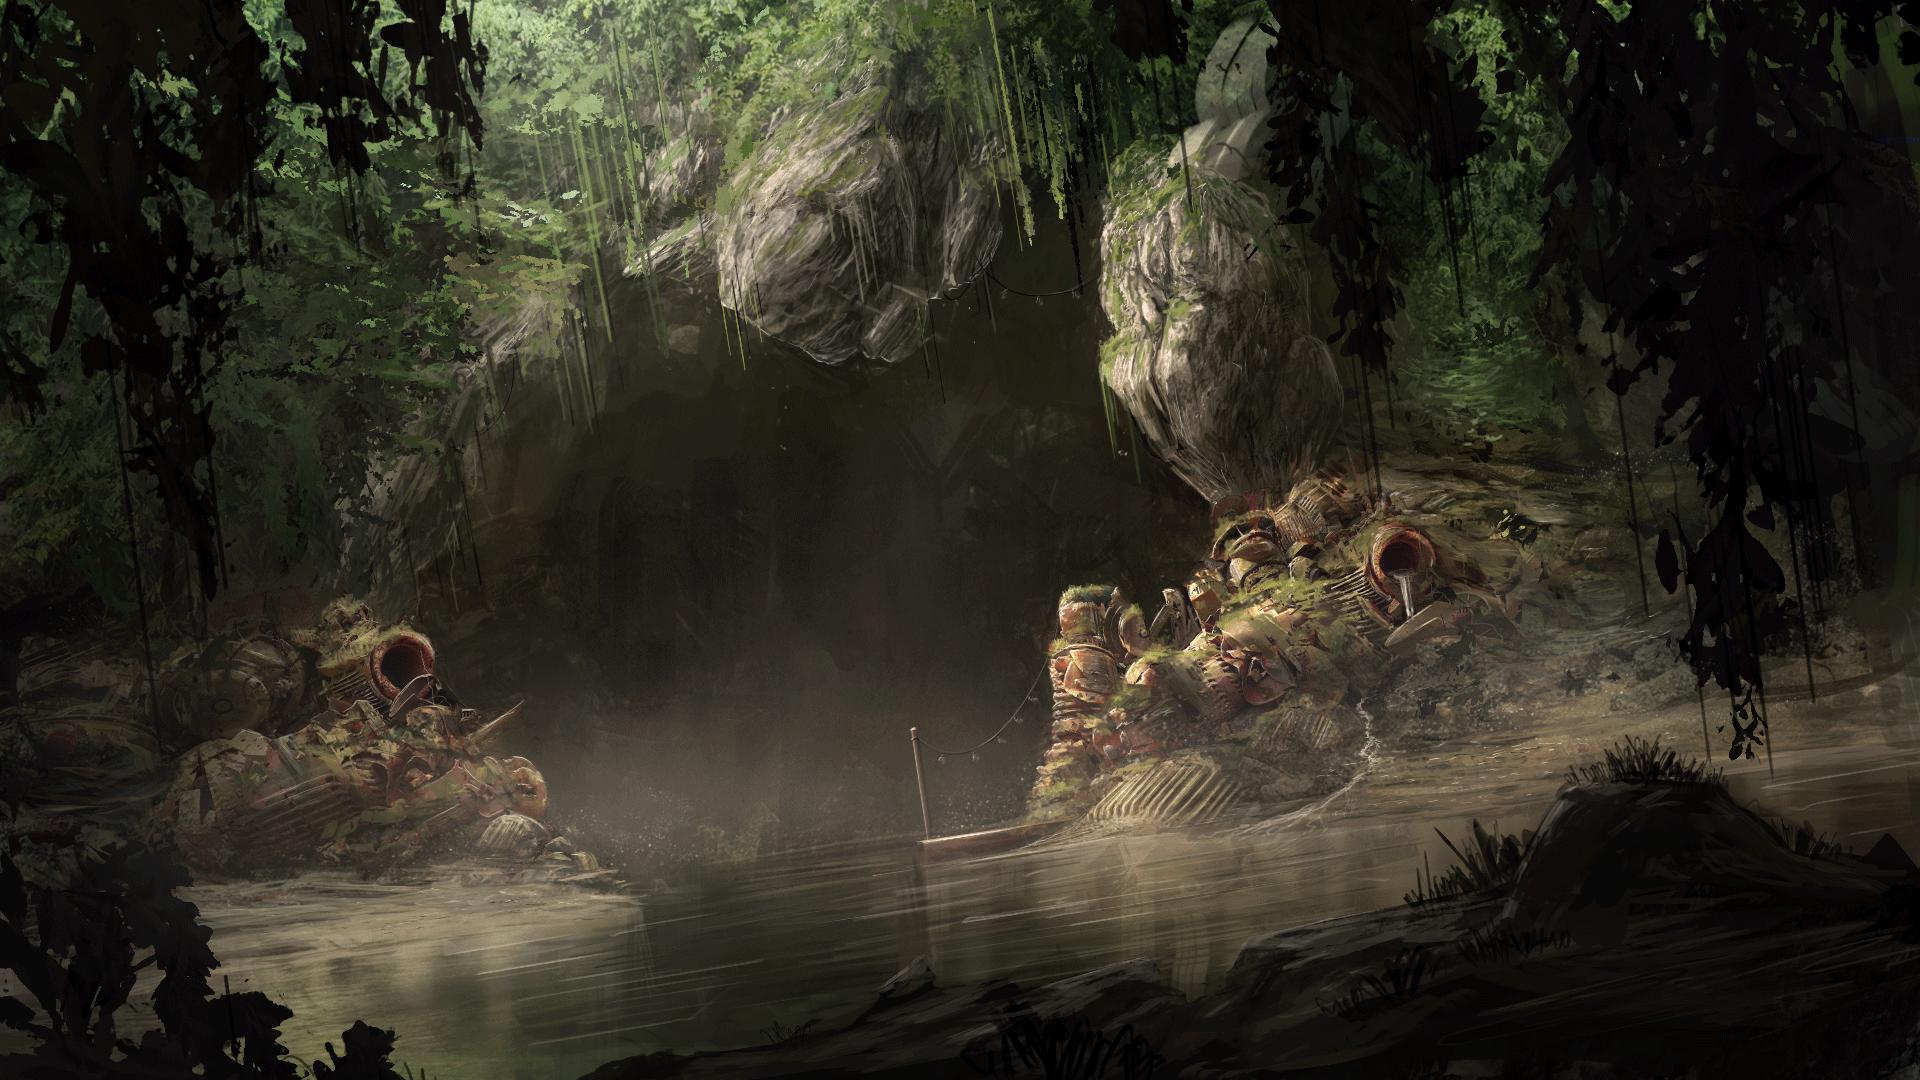 Smuggler's Cave by TomPrante